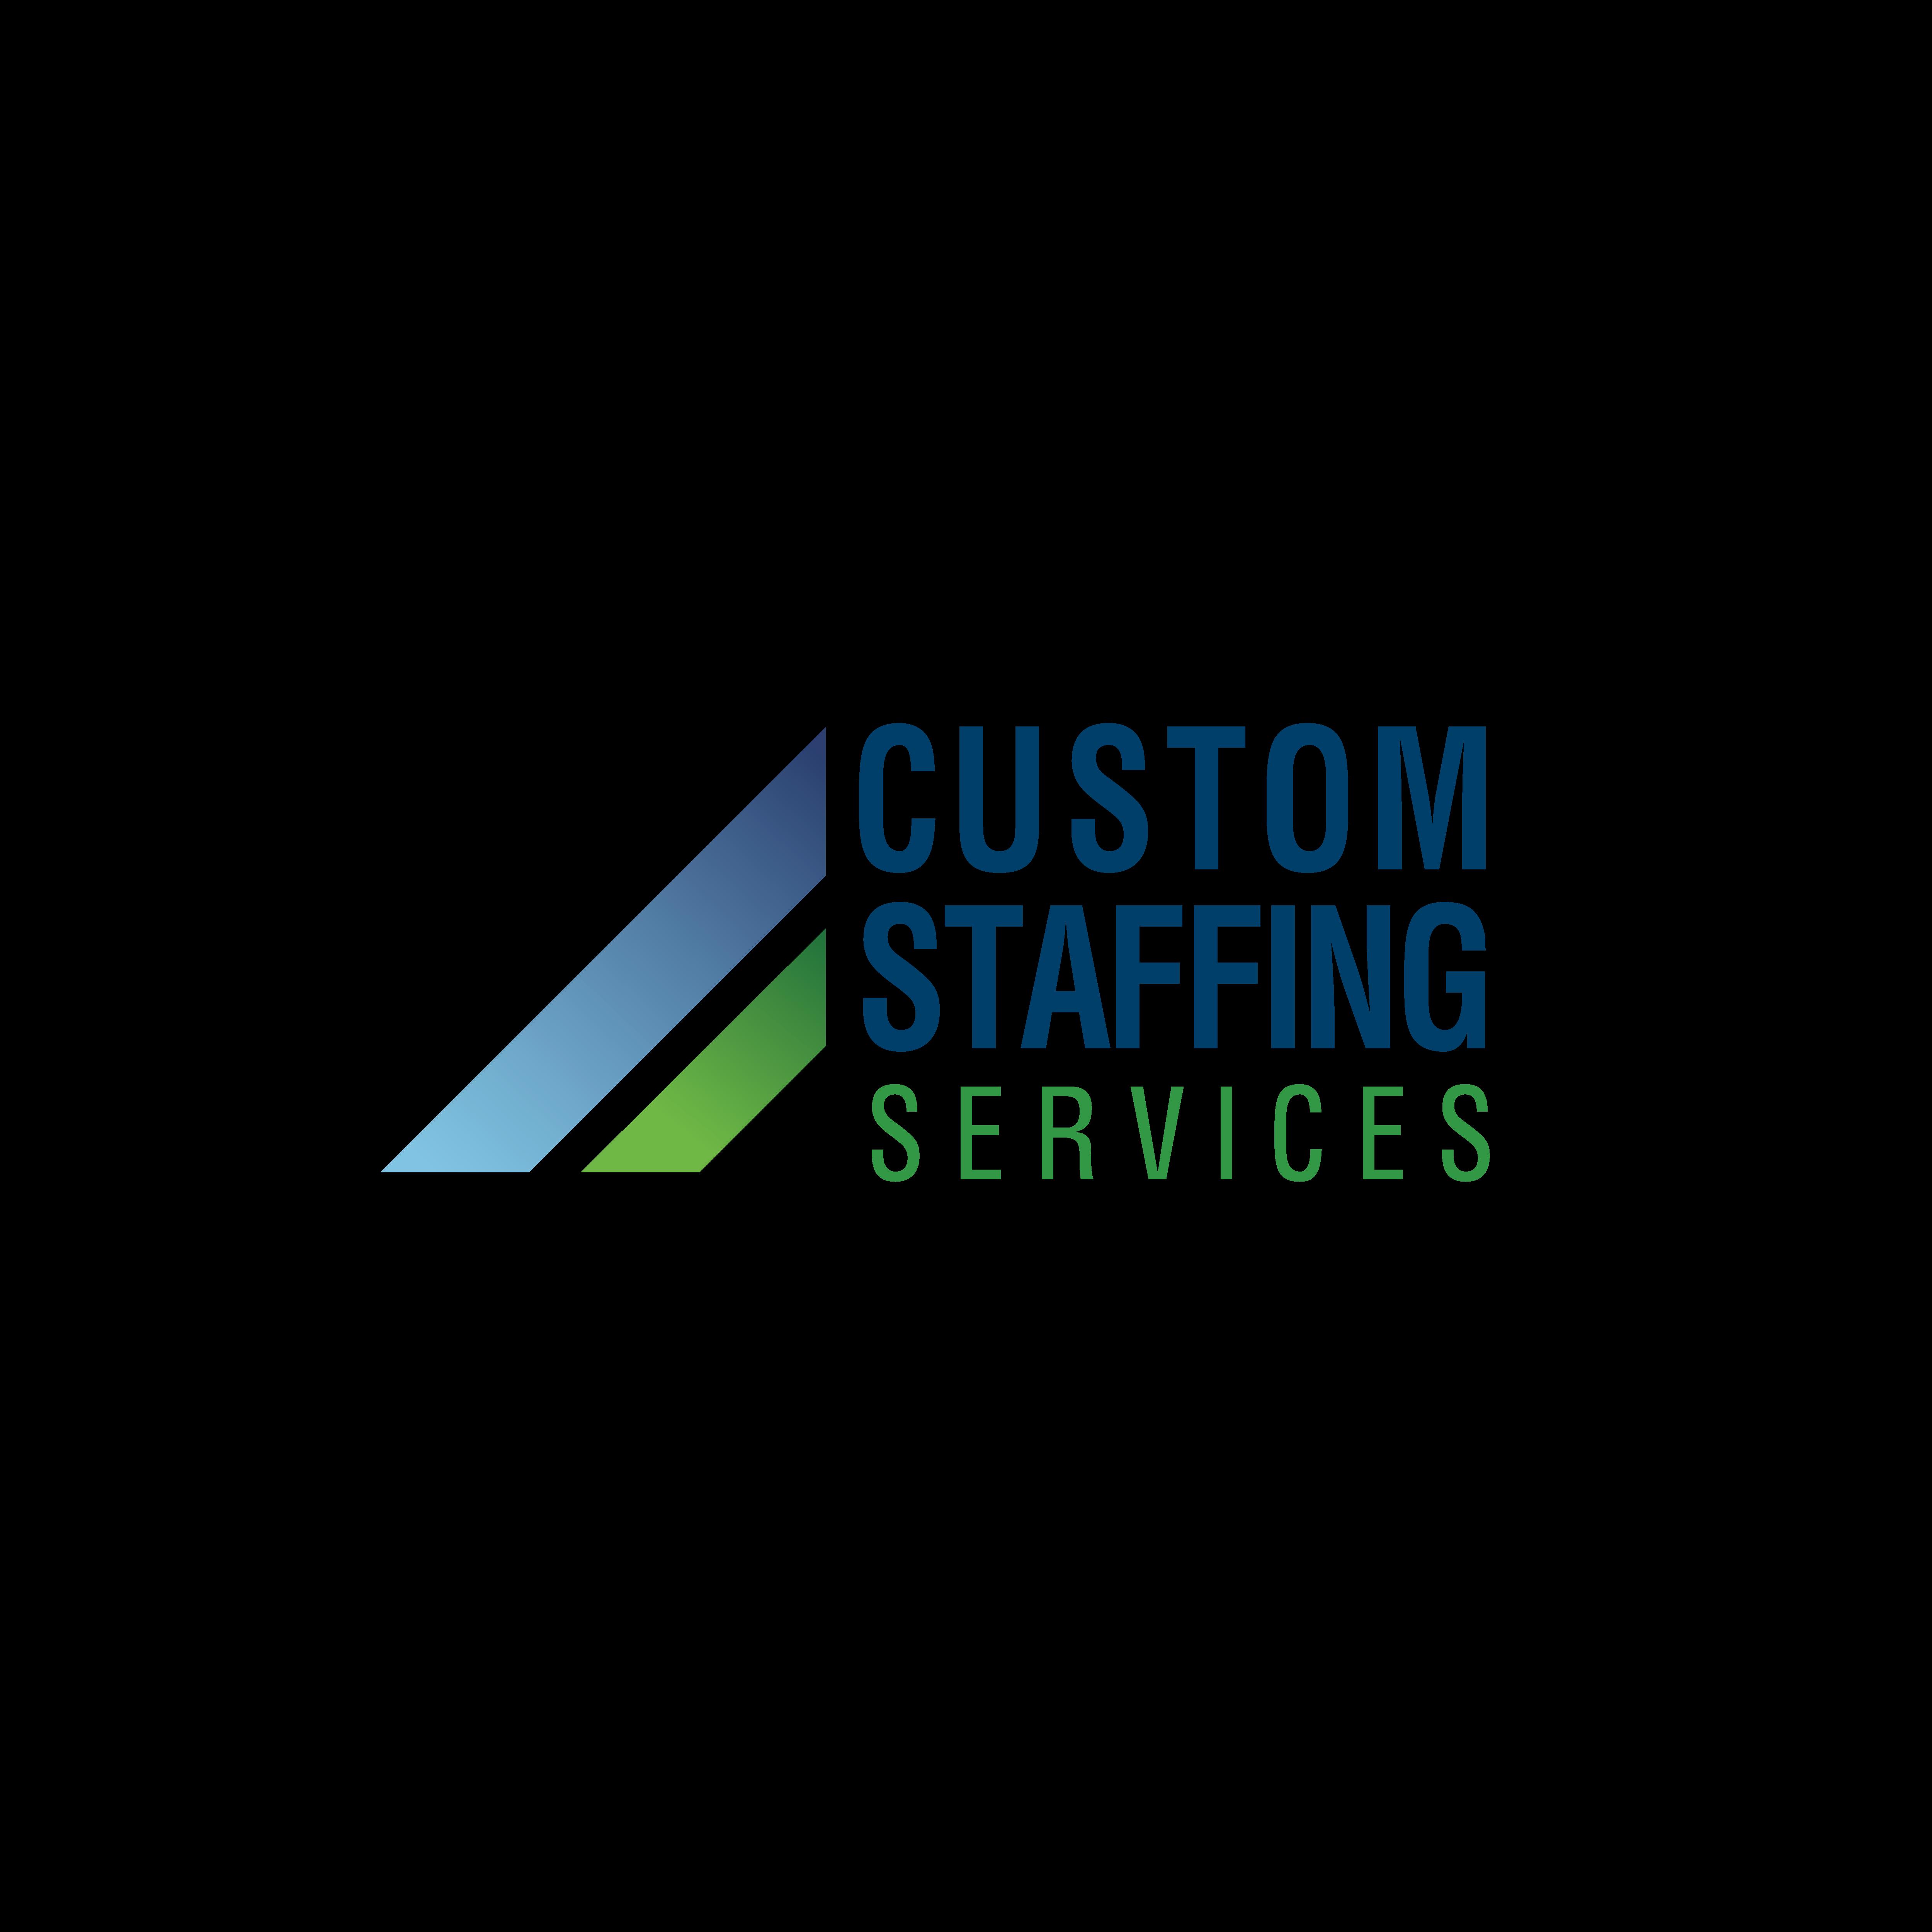 Custom Staffing